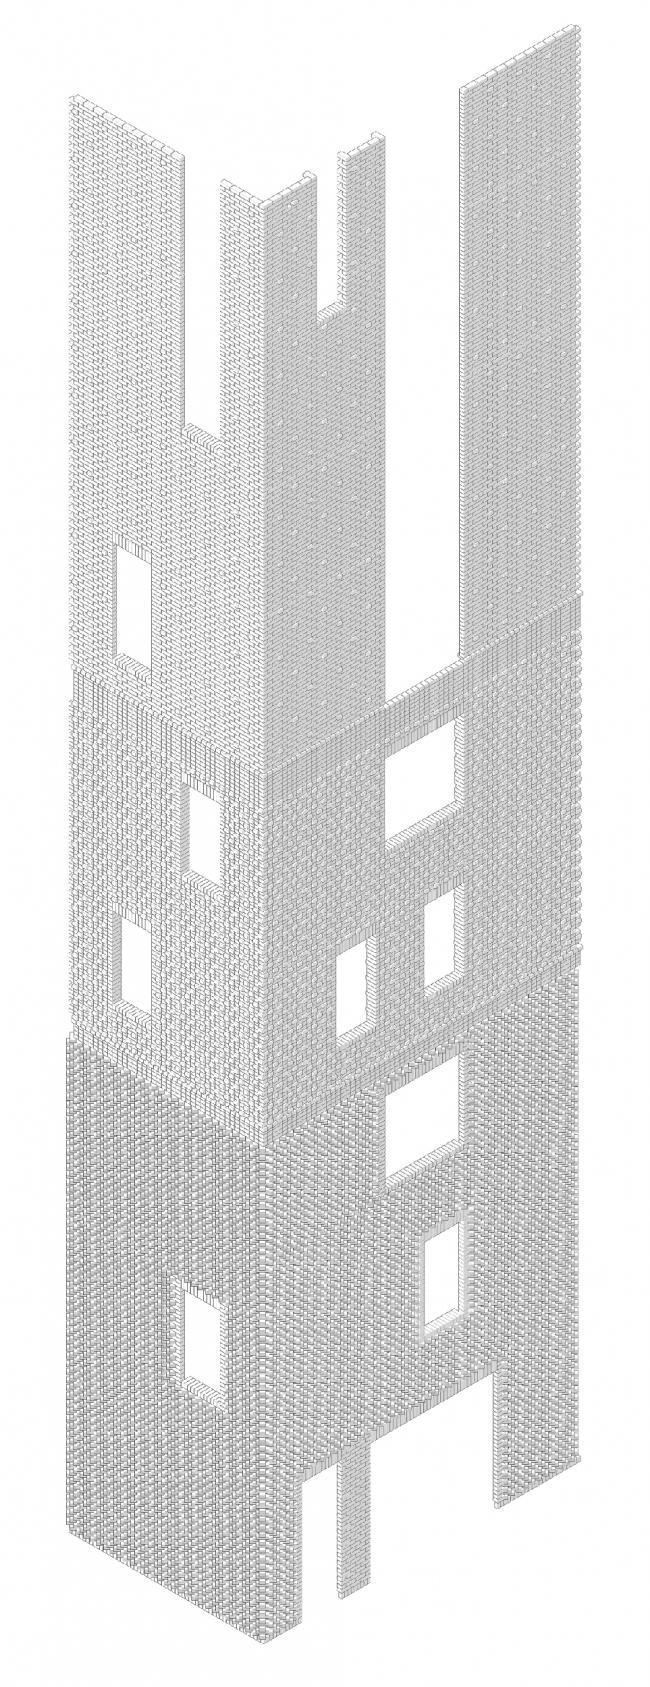 Edison House. Аксонометрия кирпичной кладки. Проект 2018 года